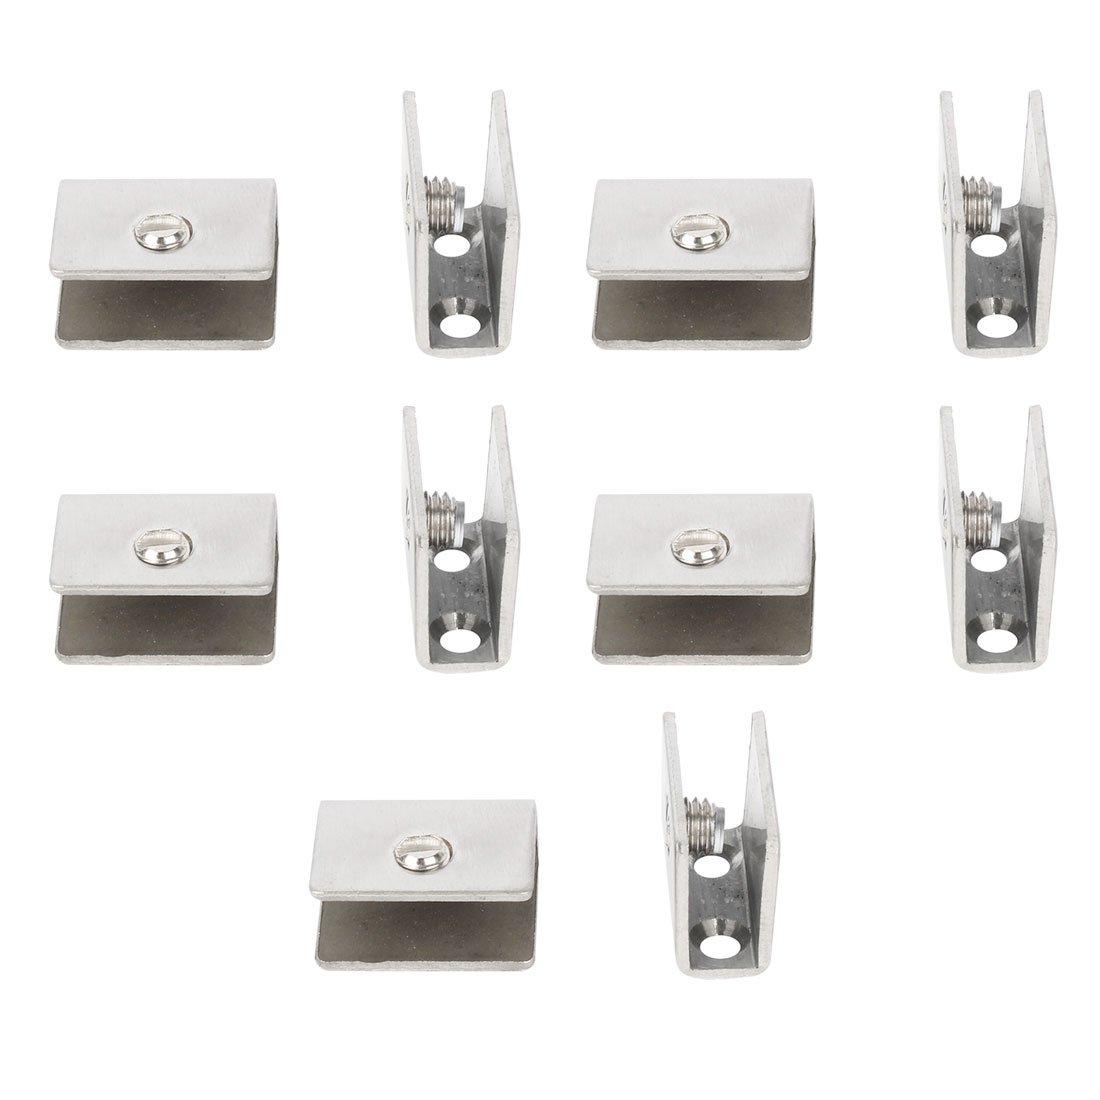 uxcell 10pcs Adjustable Brushed Stainless Steel Door Glass Shelf Clamp Brackets Holder